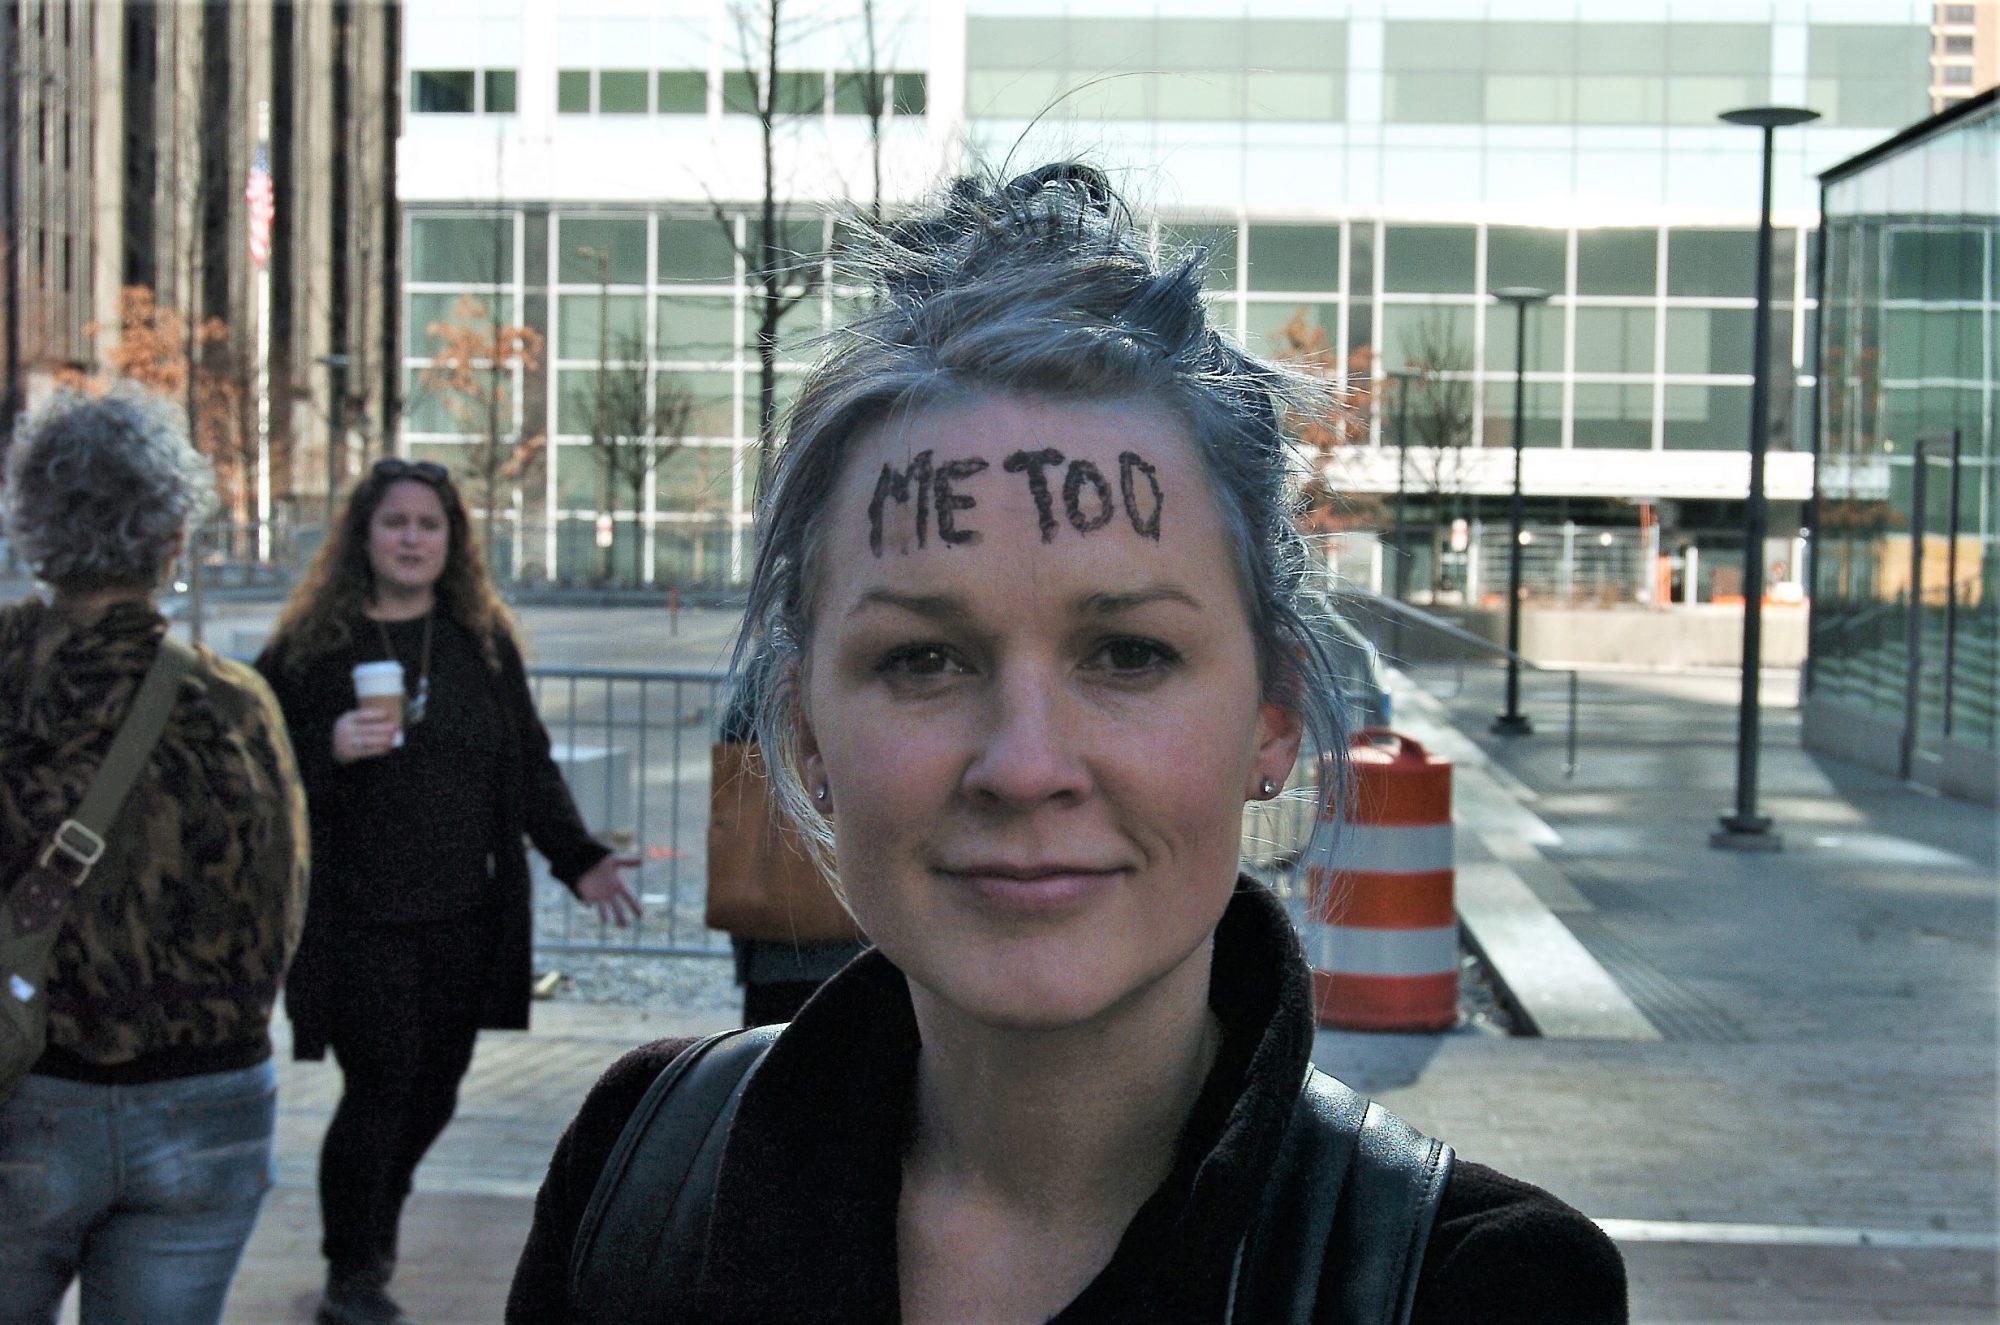 metoo-womens-march-philadelphia.jpg